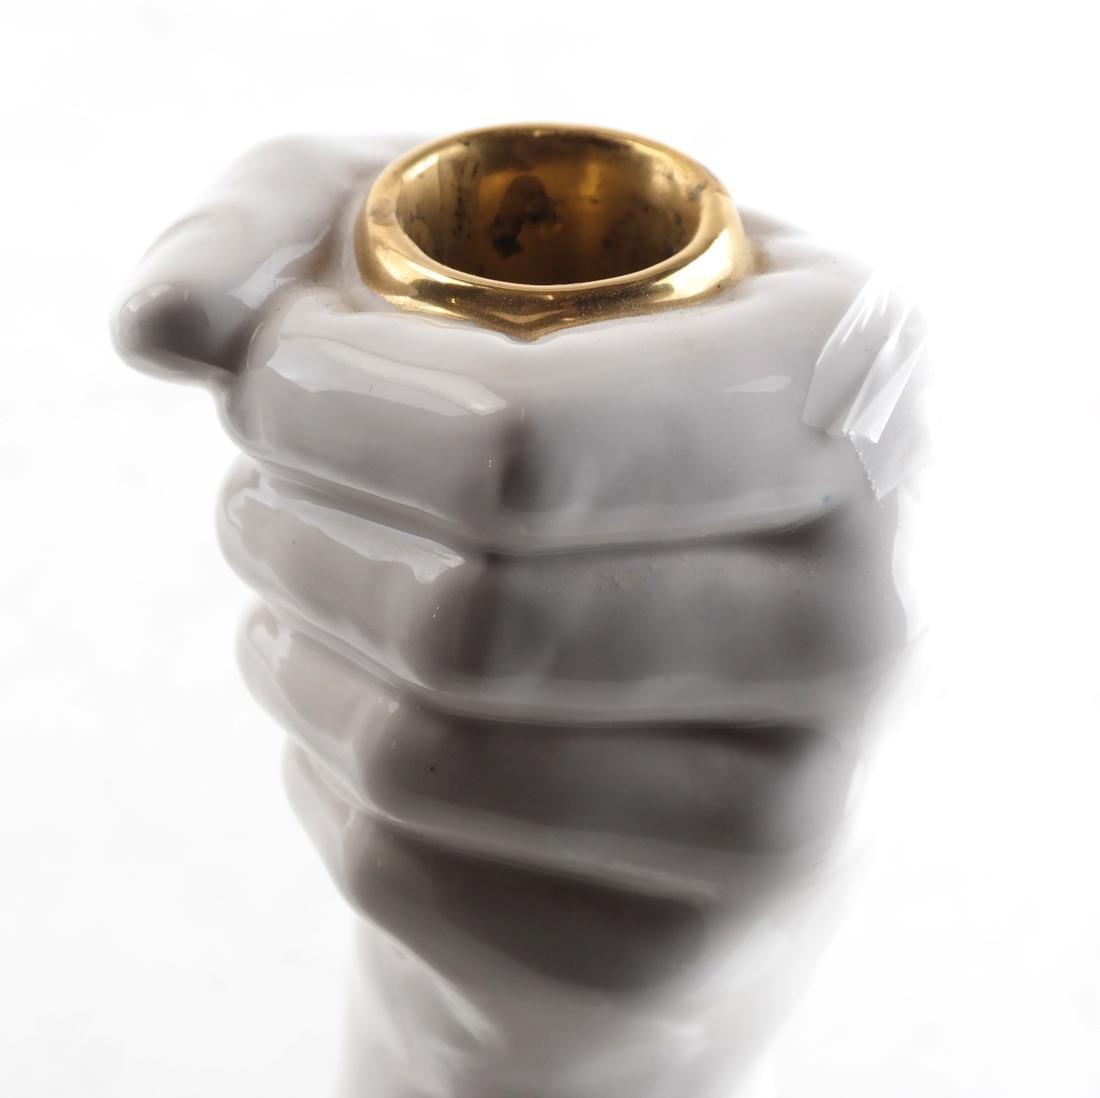 Pair of White Ceramic Fist-Form Candlesticks - 3